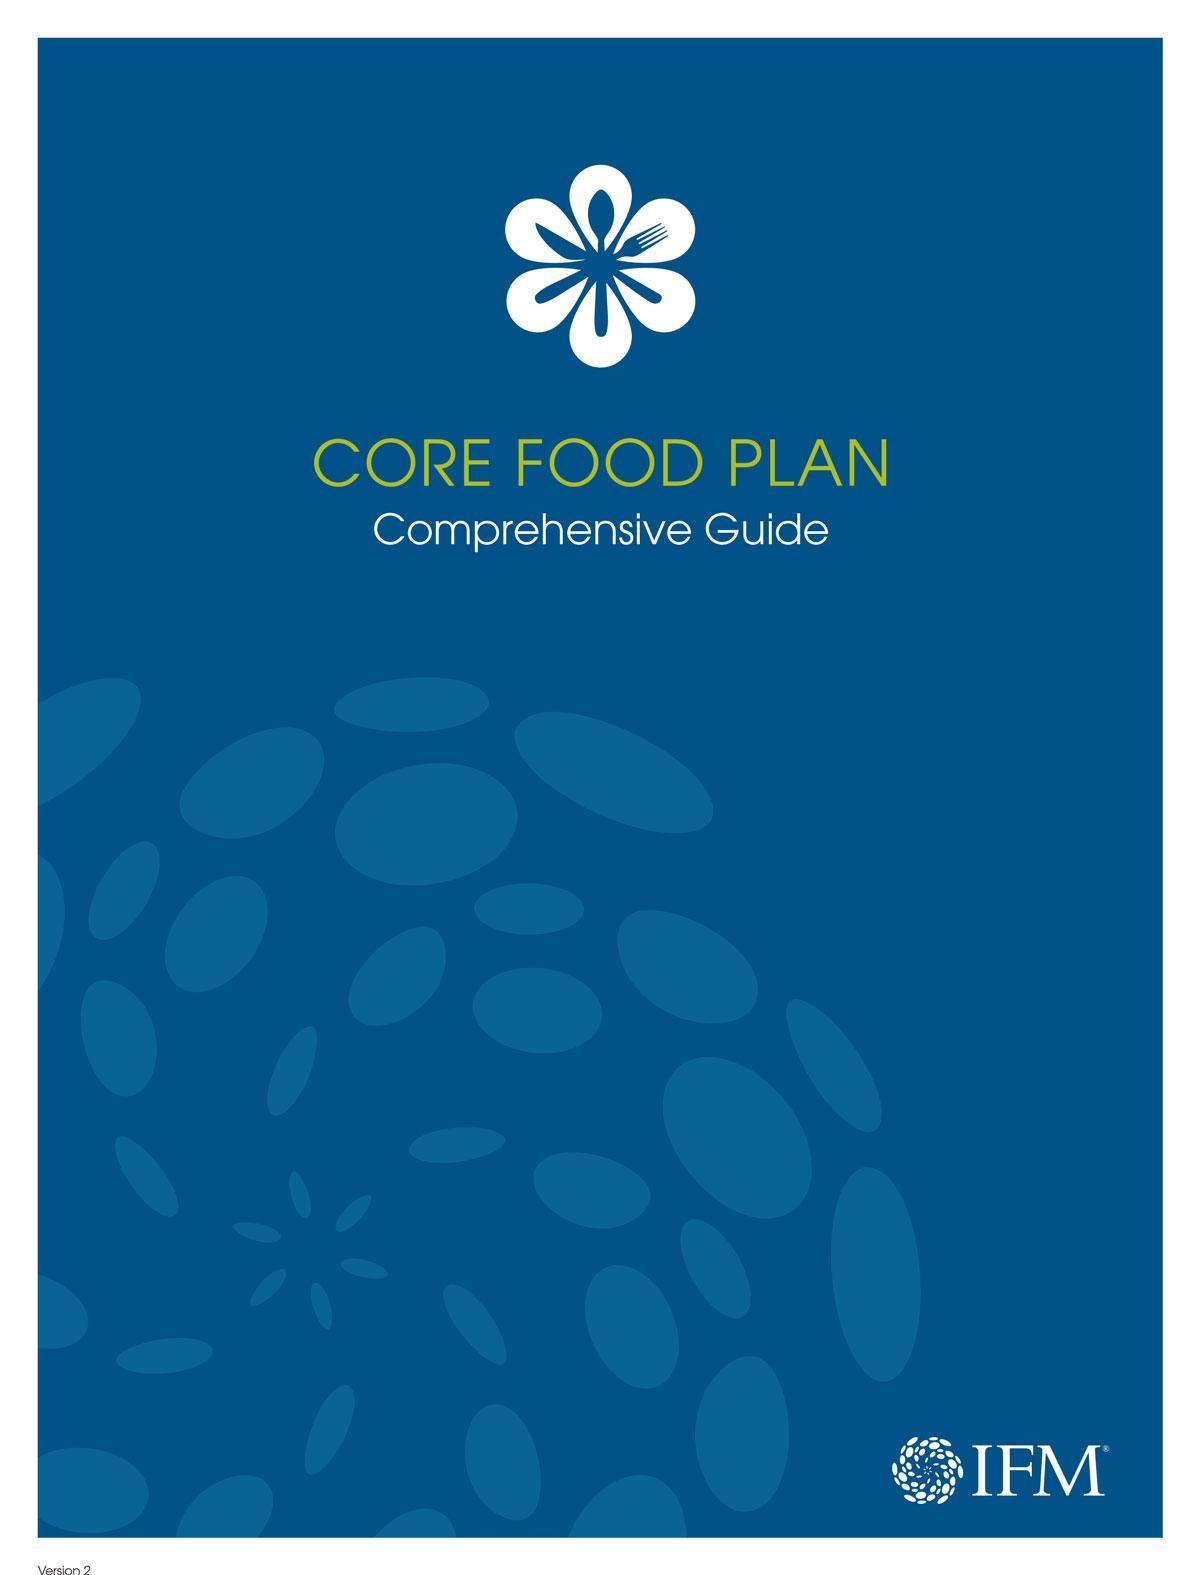 Core Food Plan Comprehensive Guide